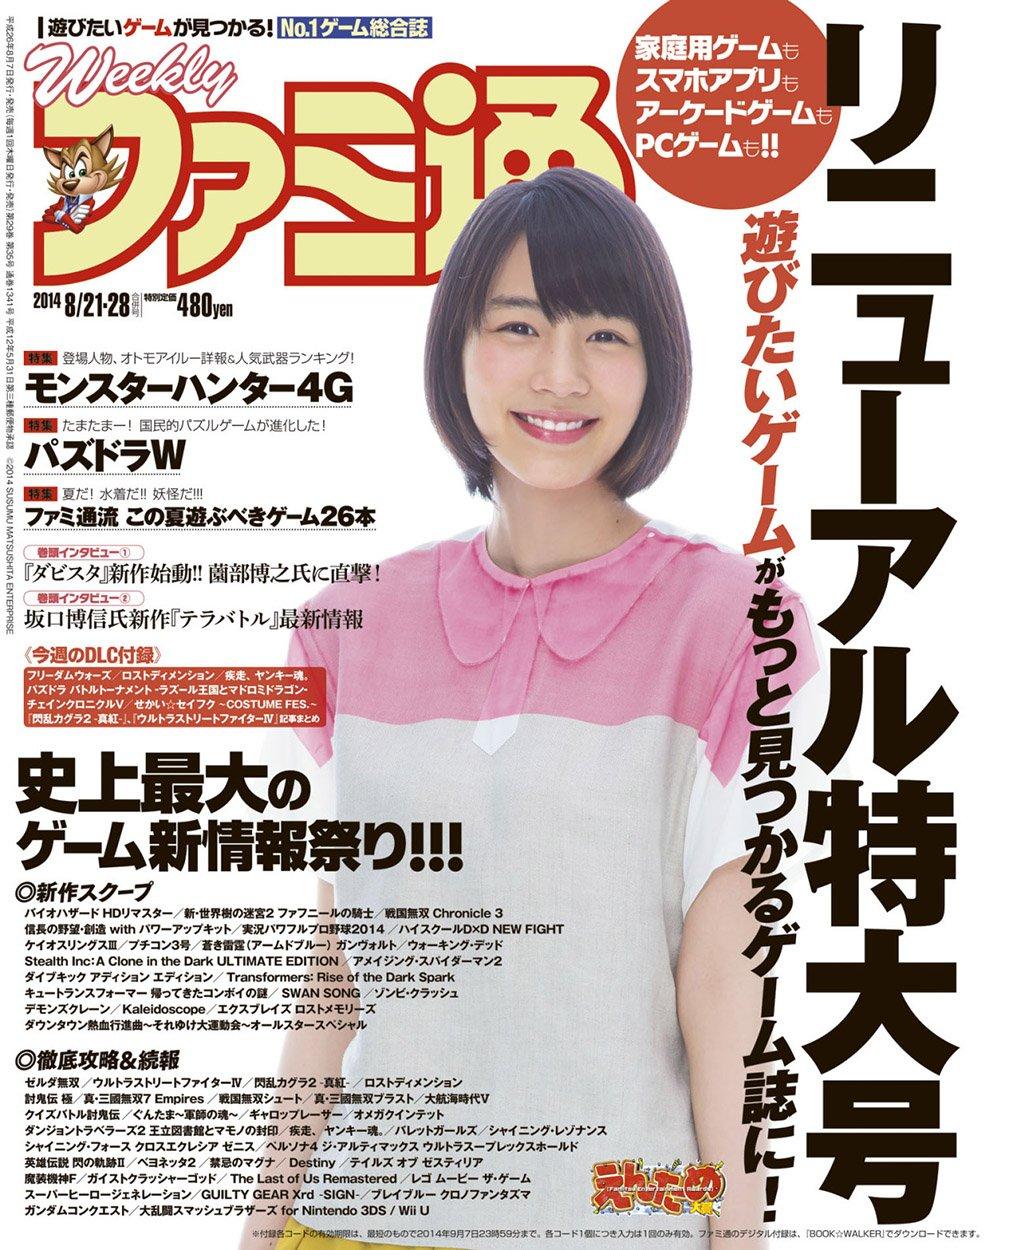 Famitsu 1341 August 21/28, 2014